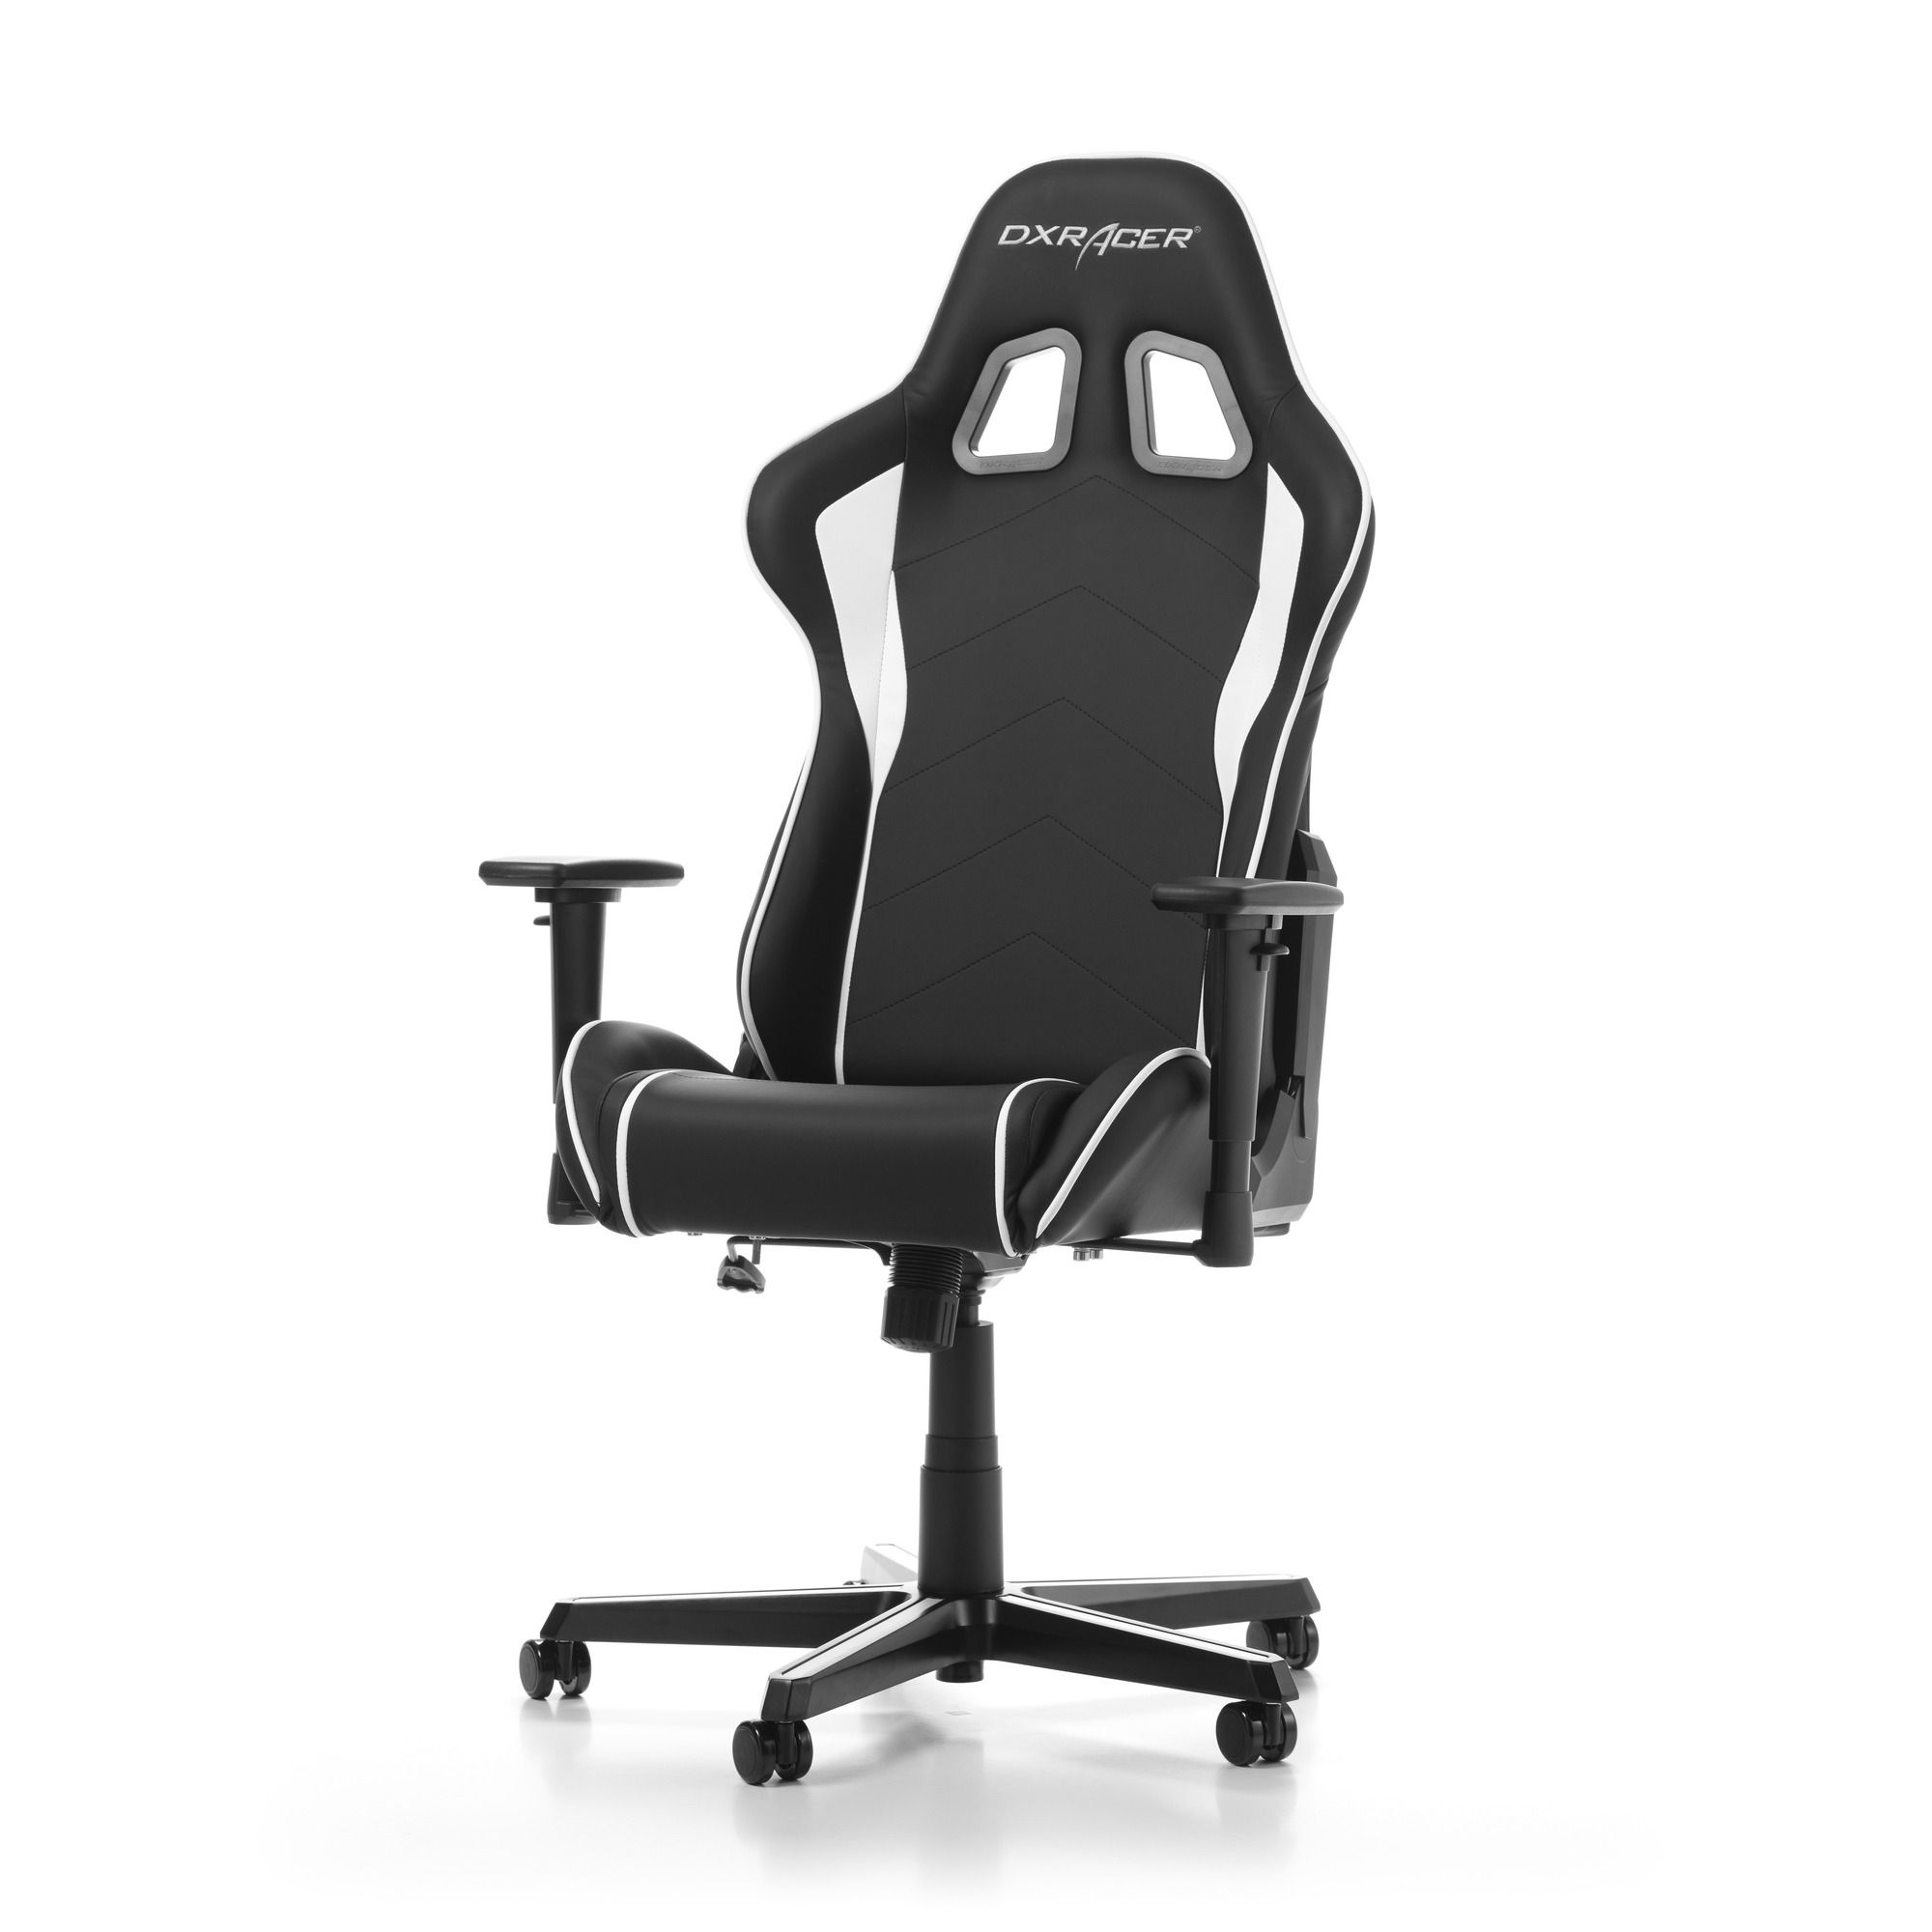 Гейминг стол DXRacer OH/FH08/NW - серия FORMULA, черен/бял - 10